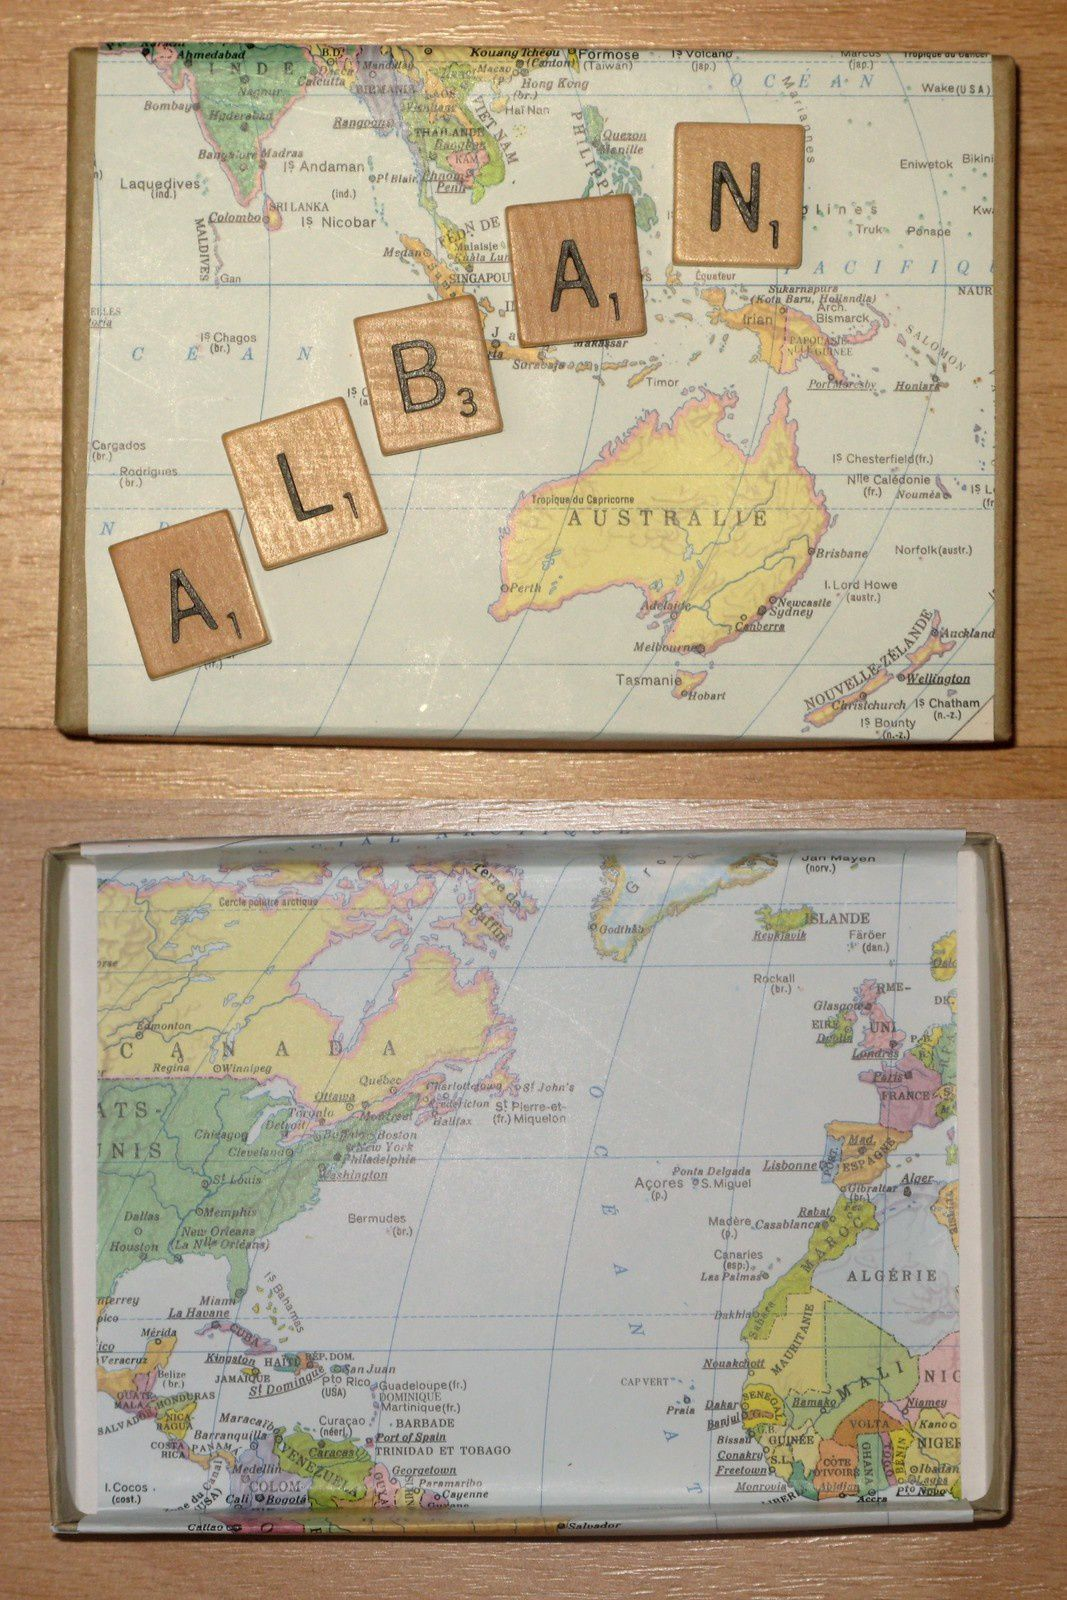 boite personnalisee, alban , carte australie canada- lettres-charlotteblabla blog-